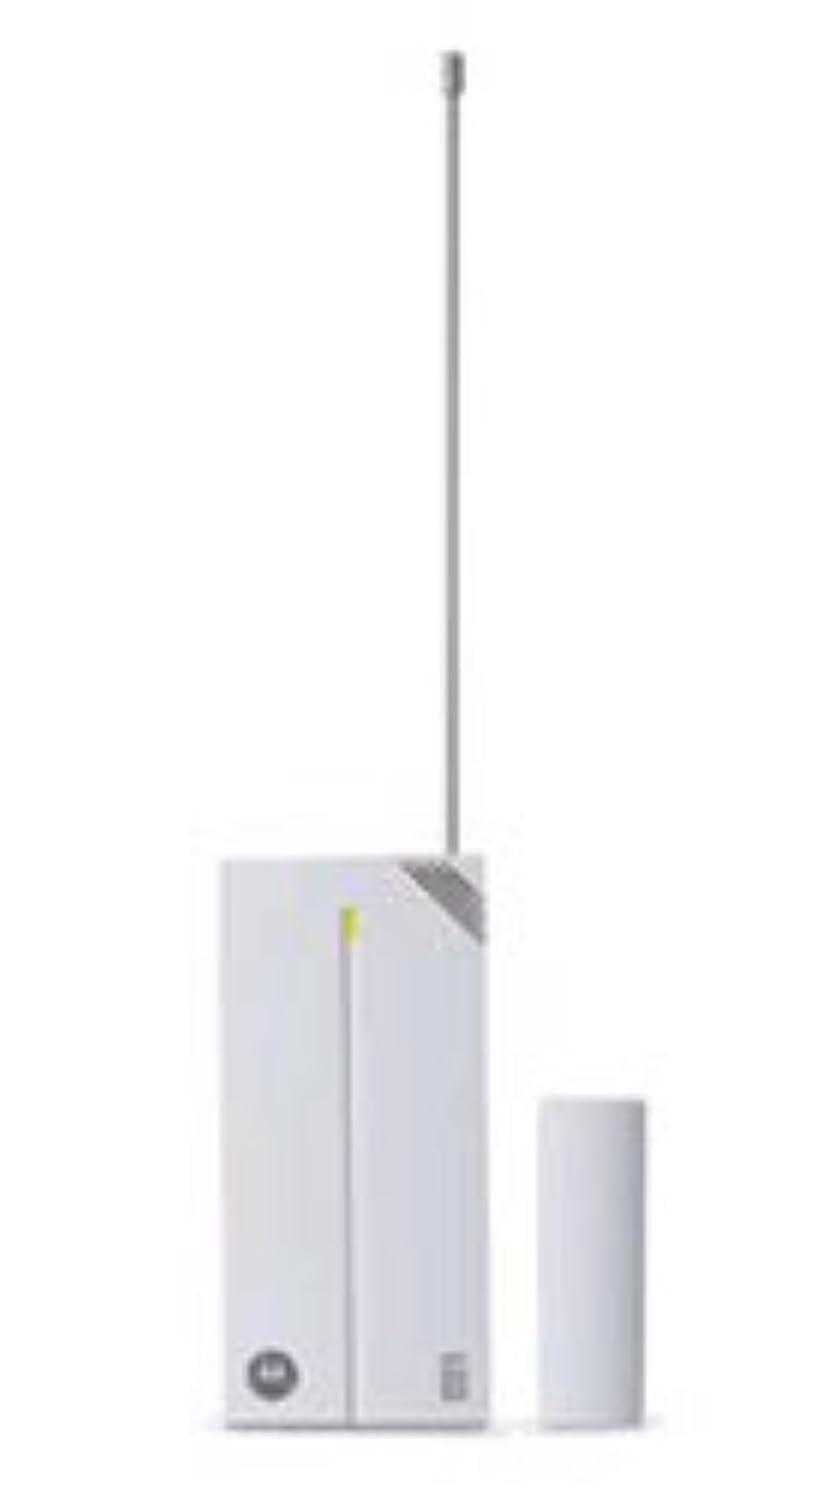 Motorola Xanboo HMDS1040 Home Monitoring and Control System Wireless Door/Window Sensor